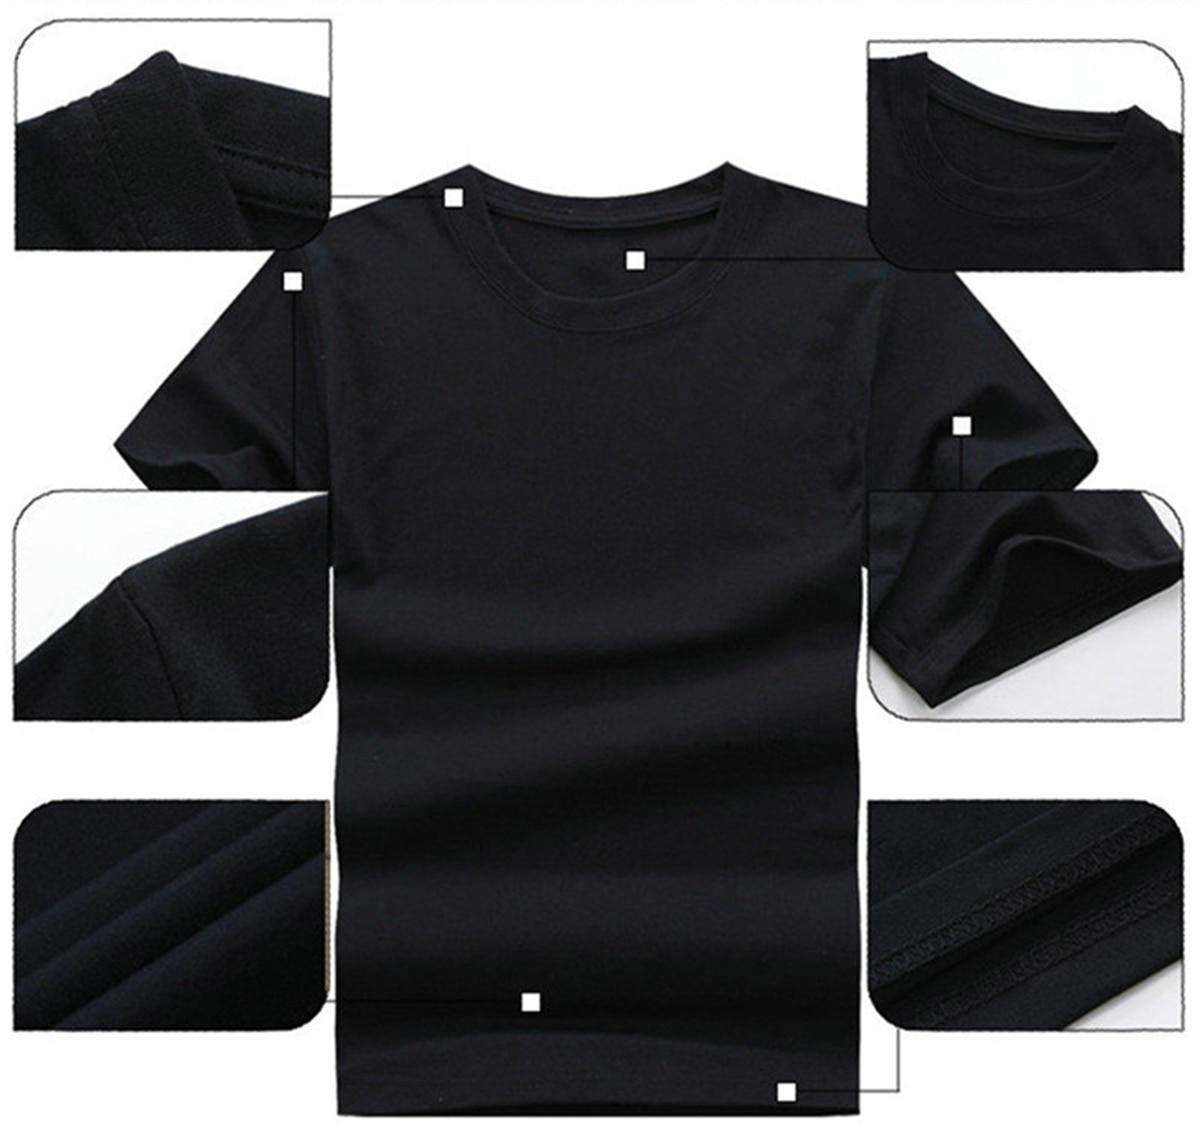 GILDAN I LOVE IT WHEN MY HUSBAND WEARS WHAT I KNIT GREAT GIFT T SHI Brand T-shirt casual top Dress female T-shirt